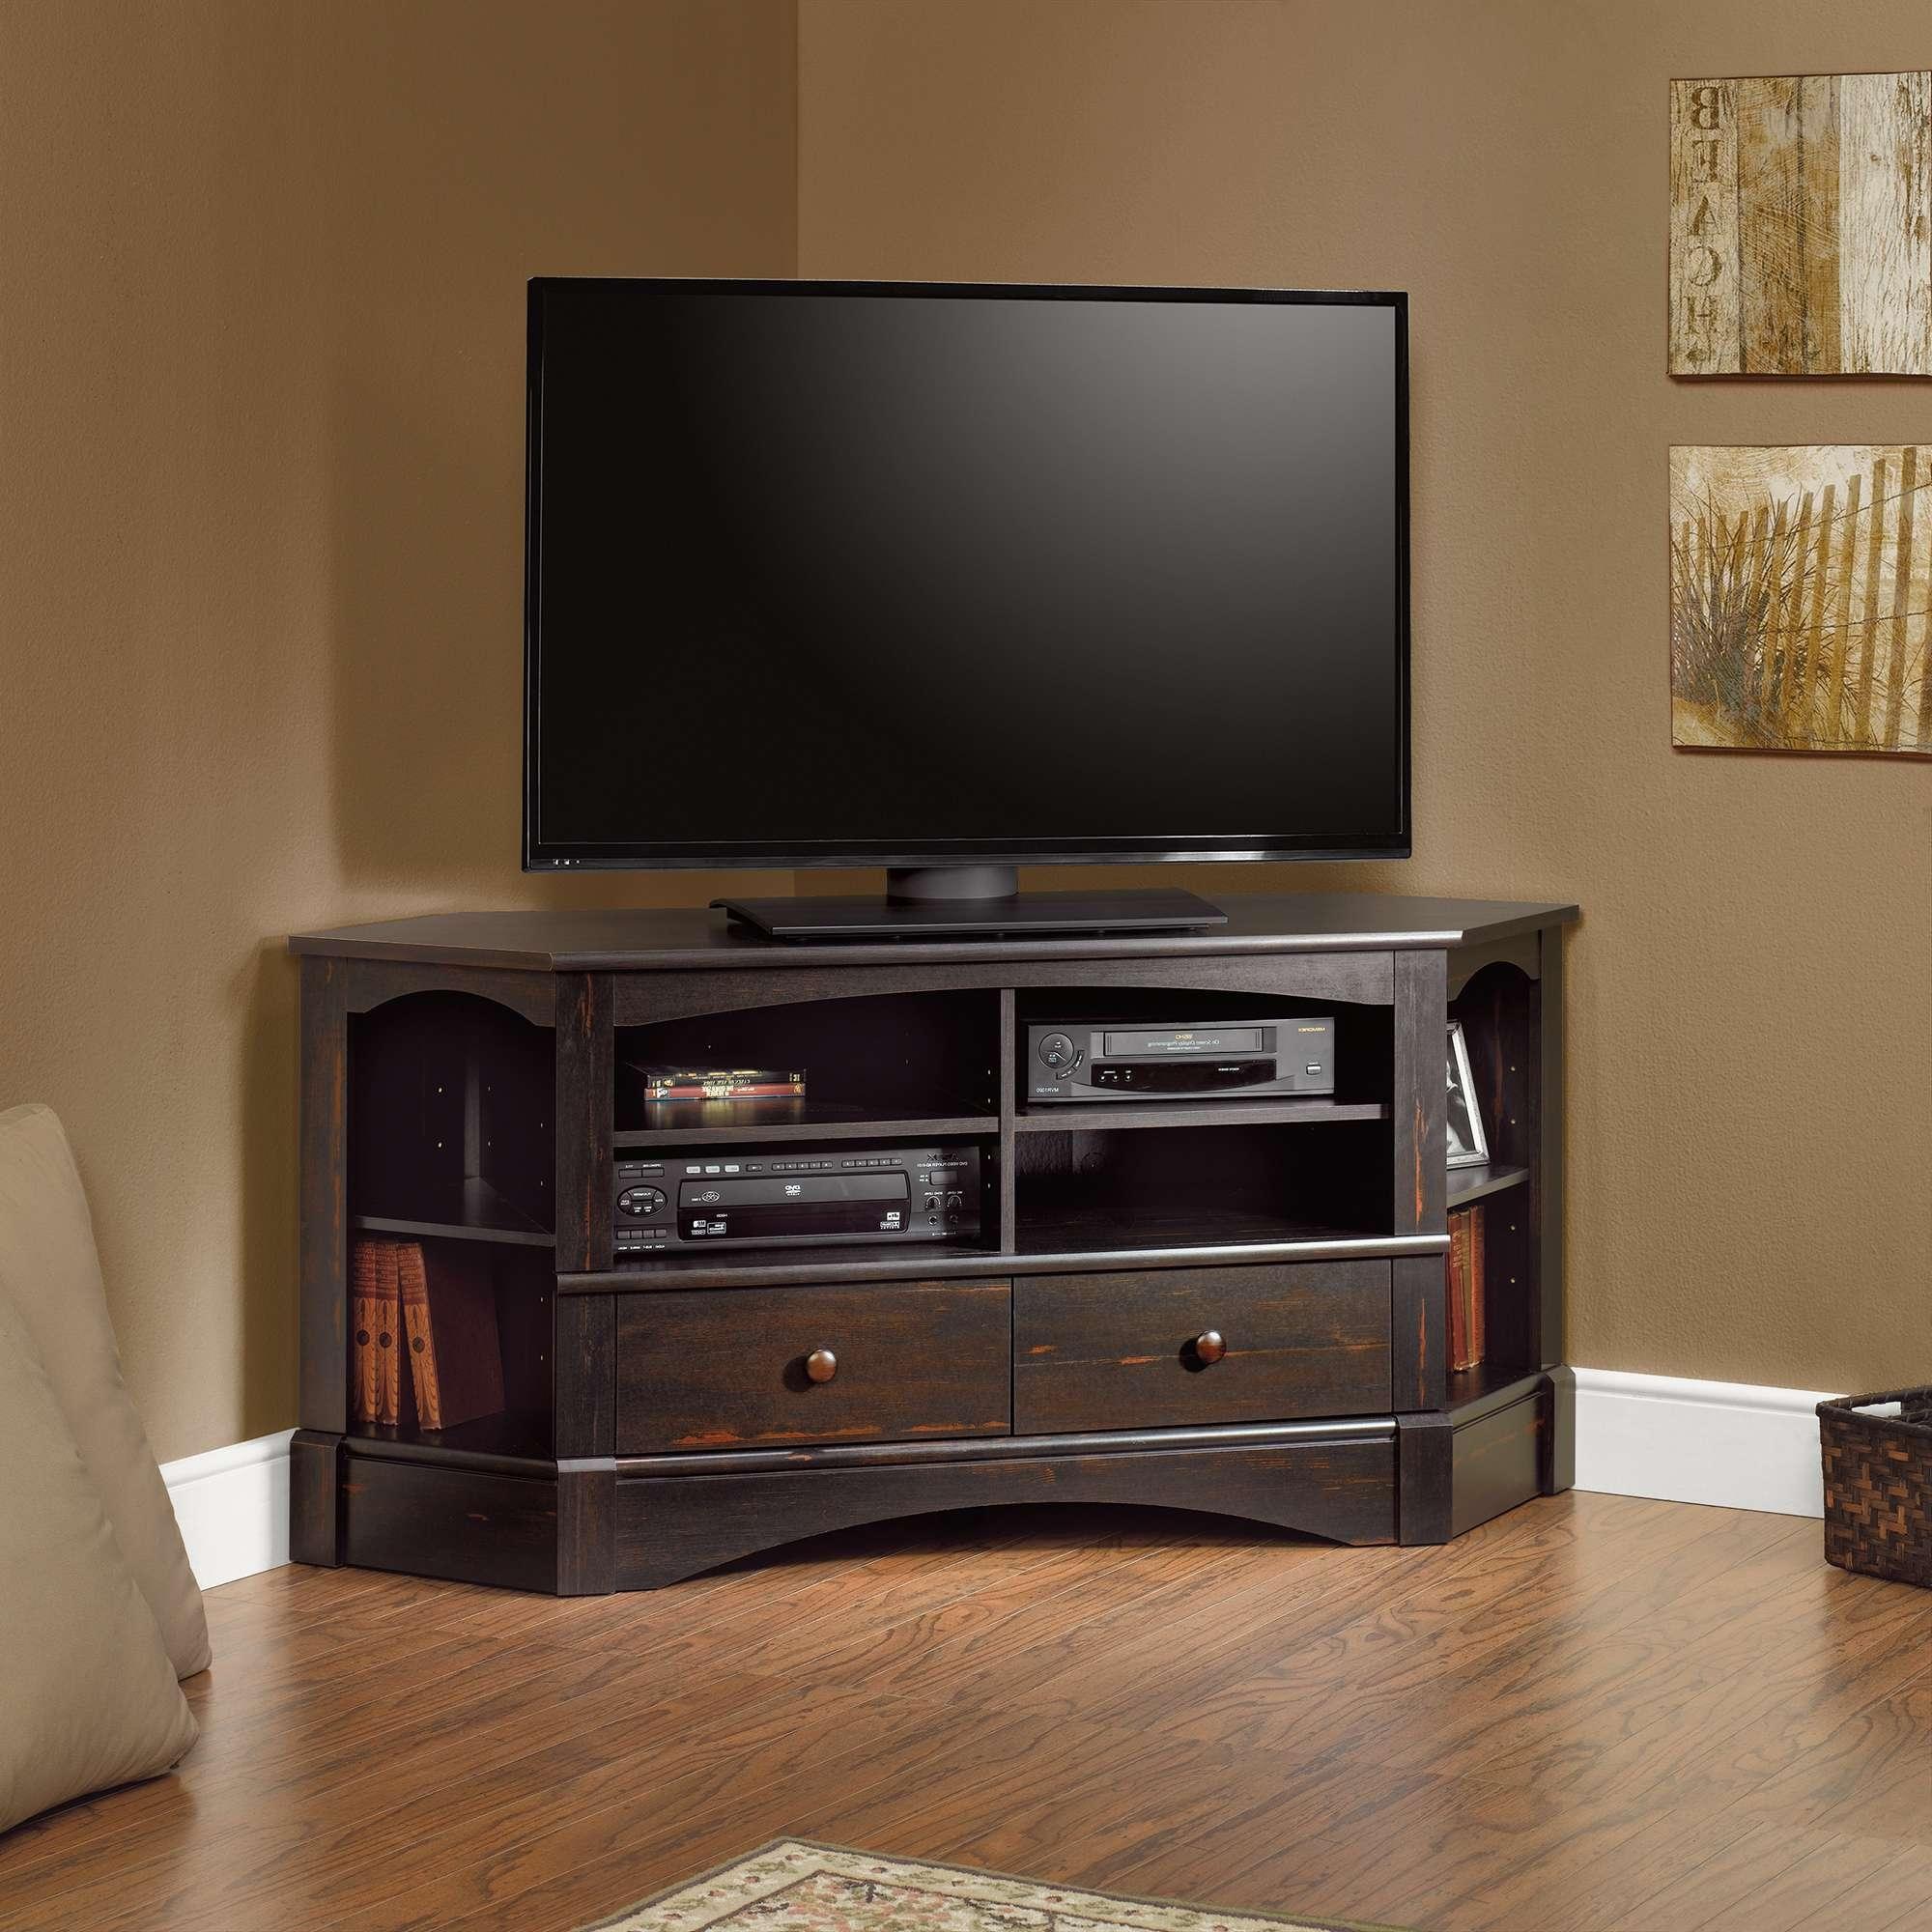 Oak Corner Tv Stands For 50 Inch Tvcorner Tv Stands For 50 Inch Tv Intended For 50 Inch Corner Tv Cabinets (View 9 of 20)